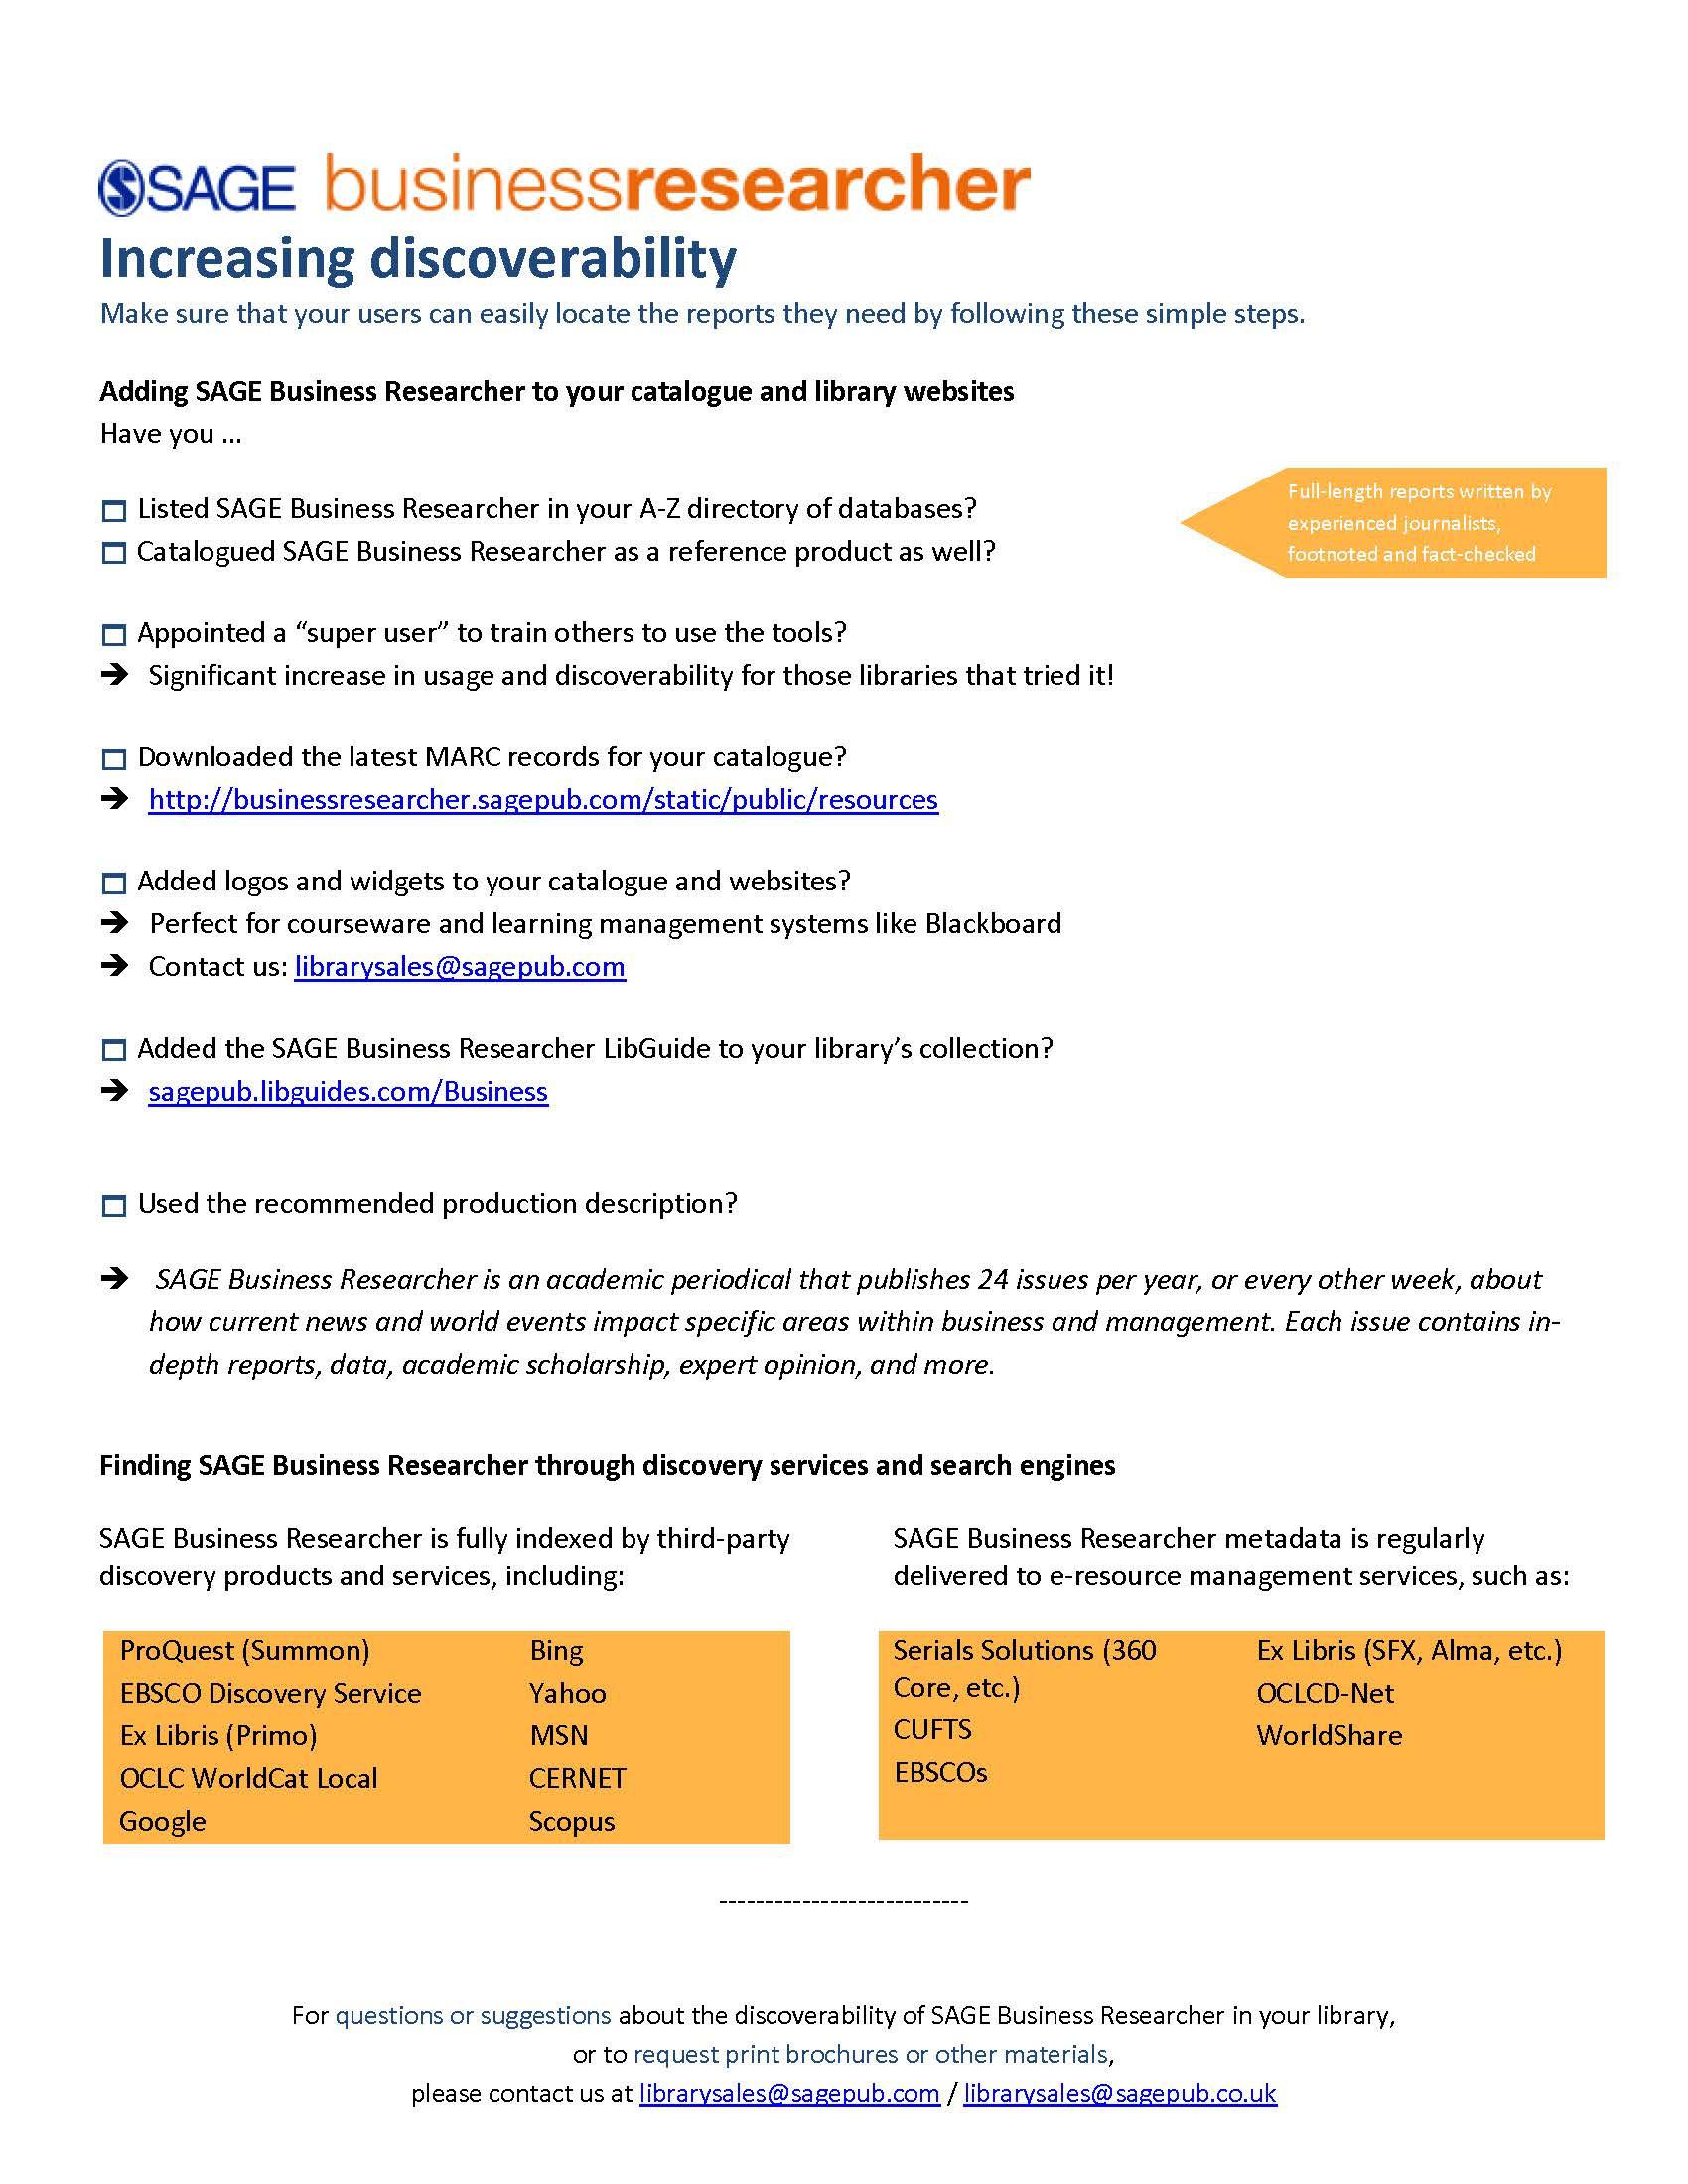 SAGE Business Researcher Discoverability Checklist